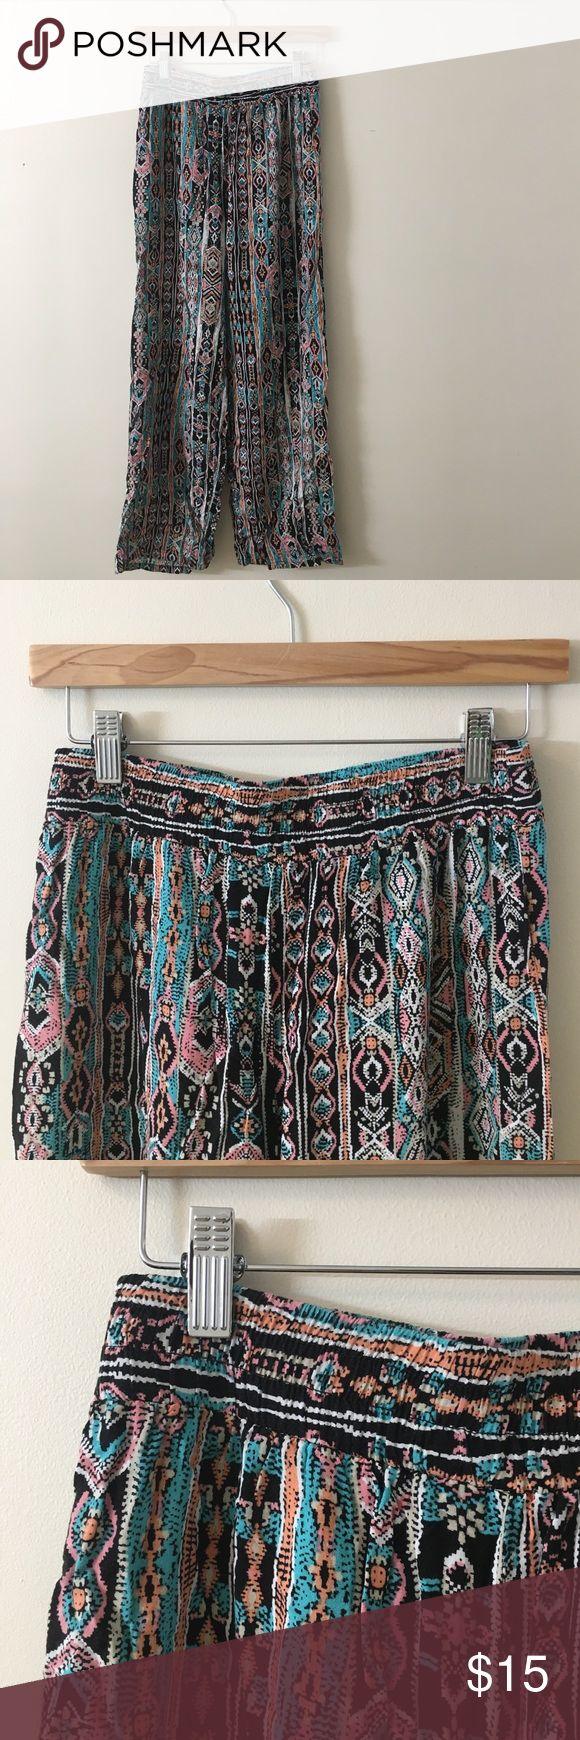 Aztec Pants Aztec patterned pants, these run small, they say large but fit a size 2-6. Joe Benbasset (Joe B) Pants